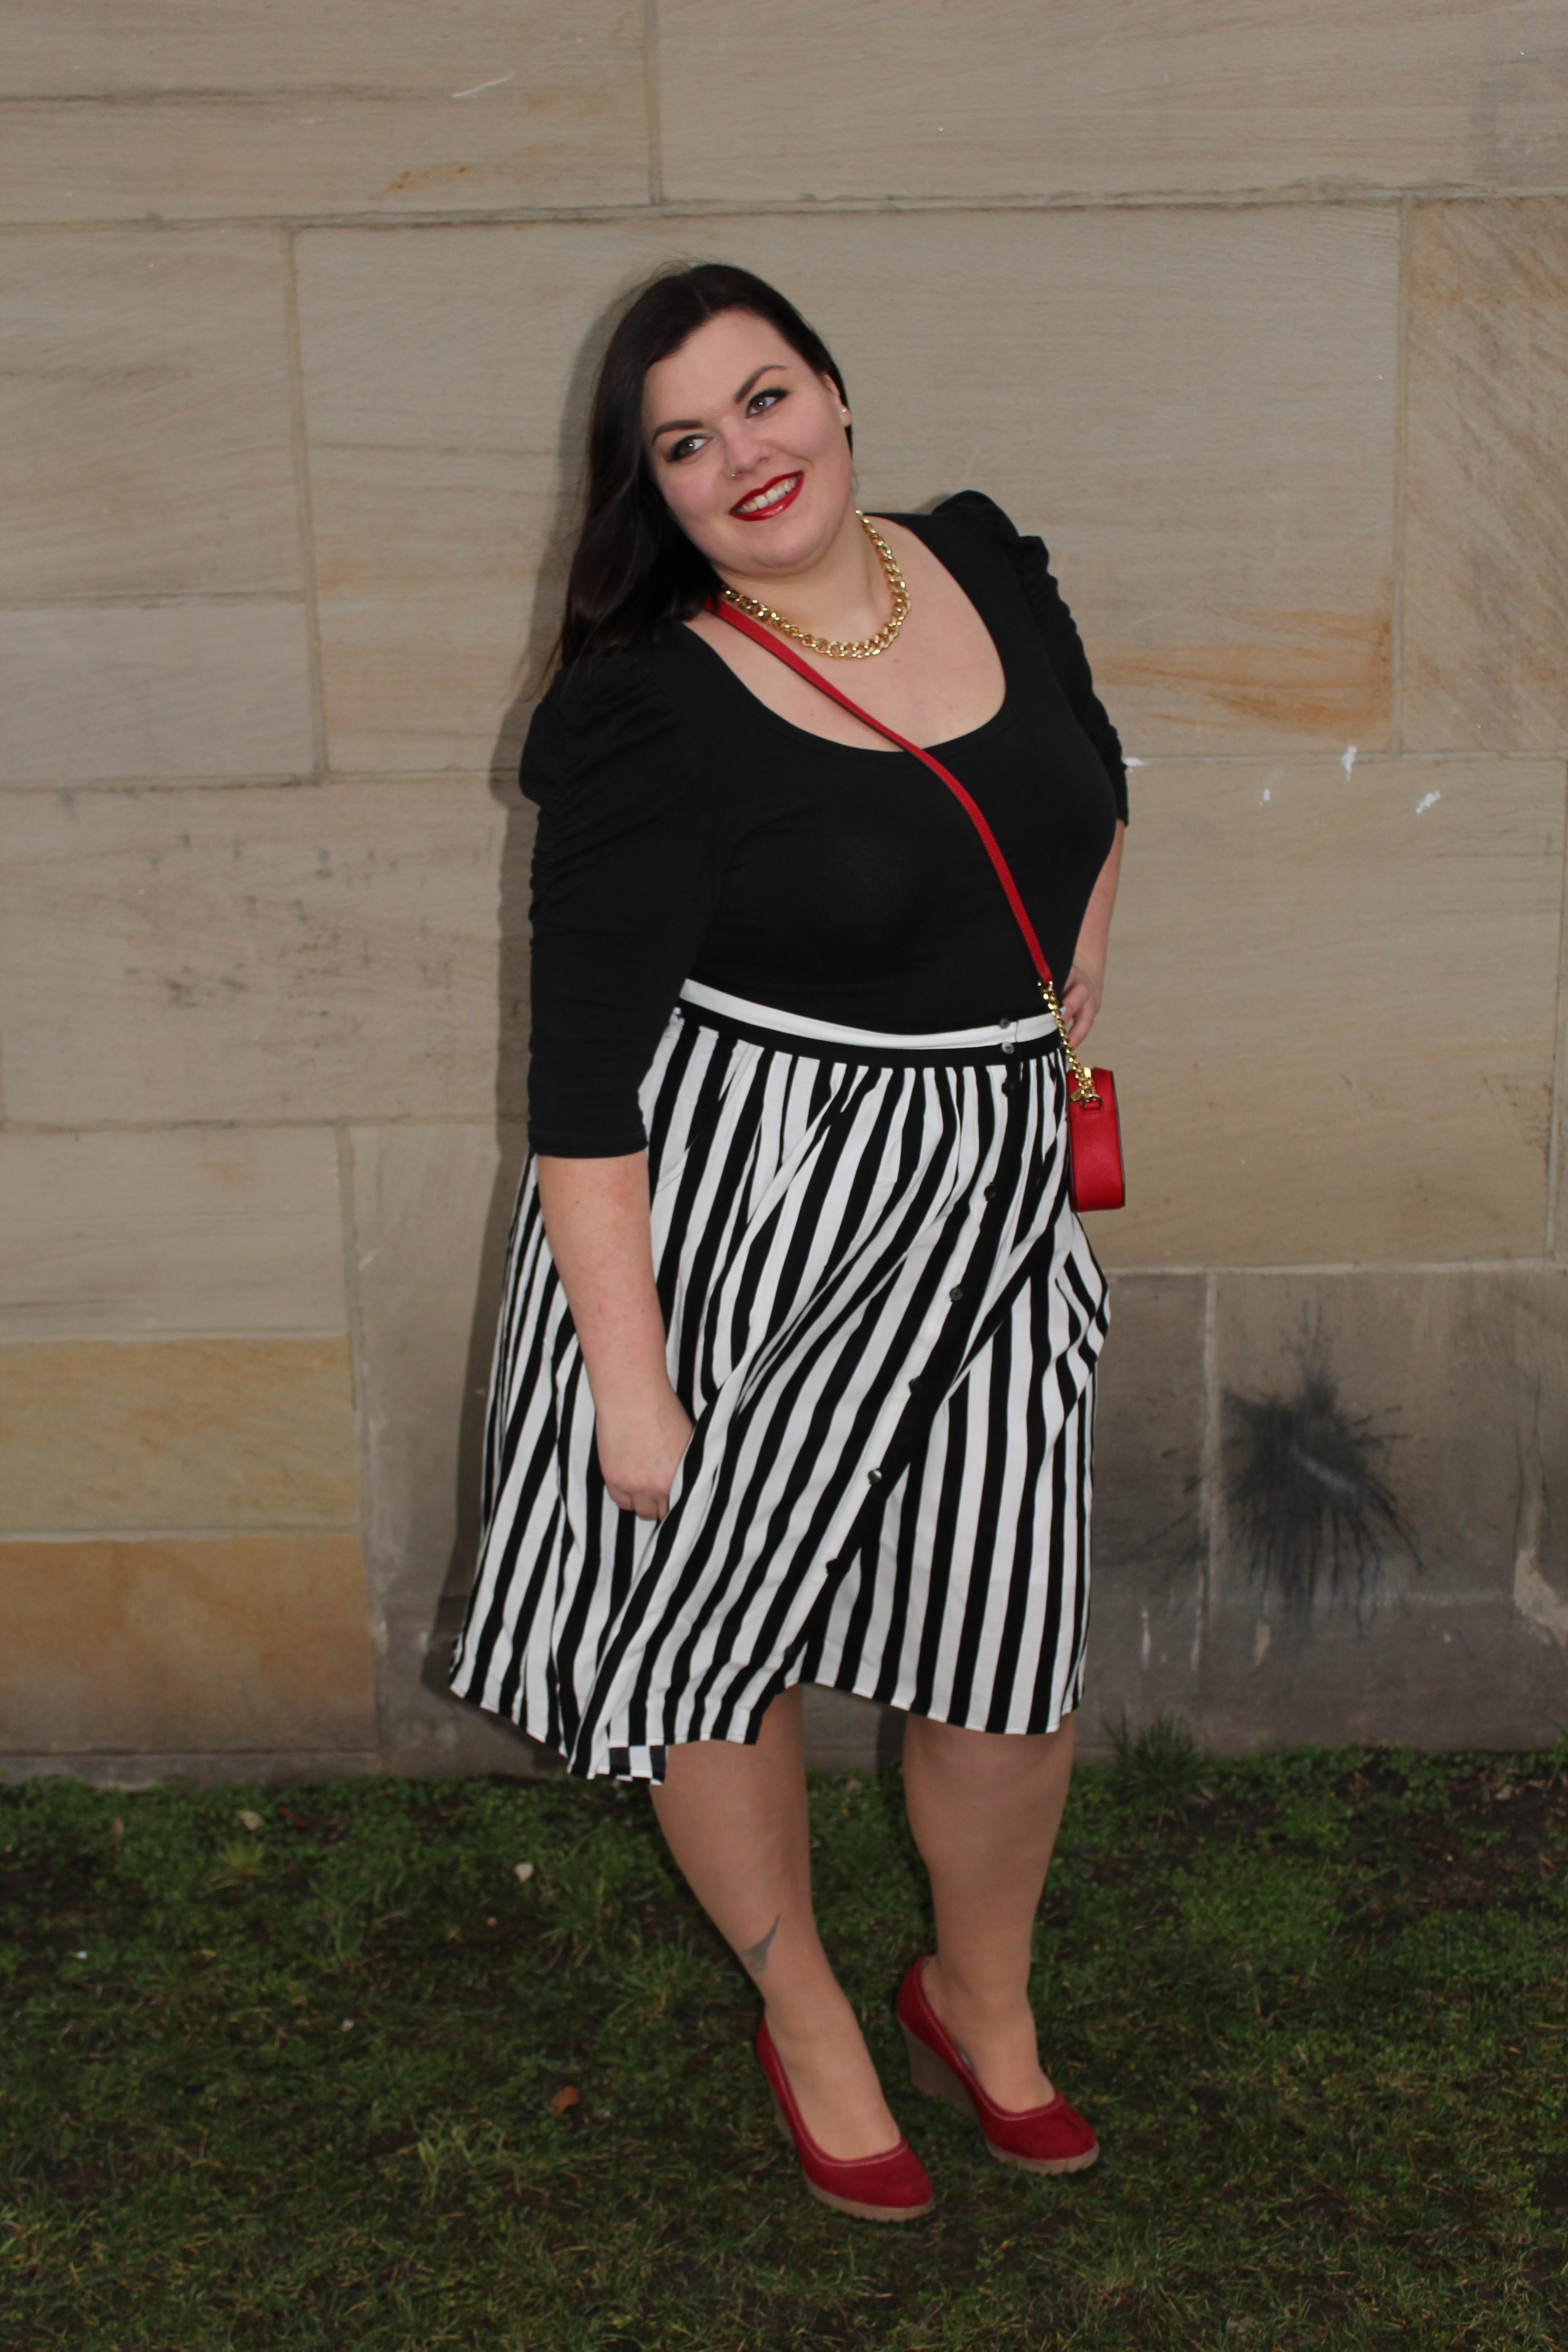 Anna Curve Stripes Stripes Stripes file name